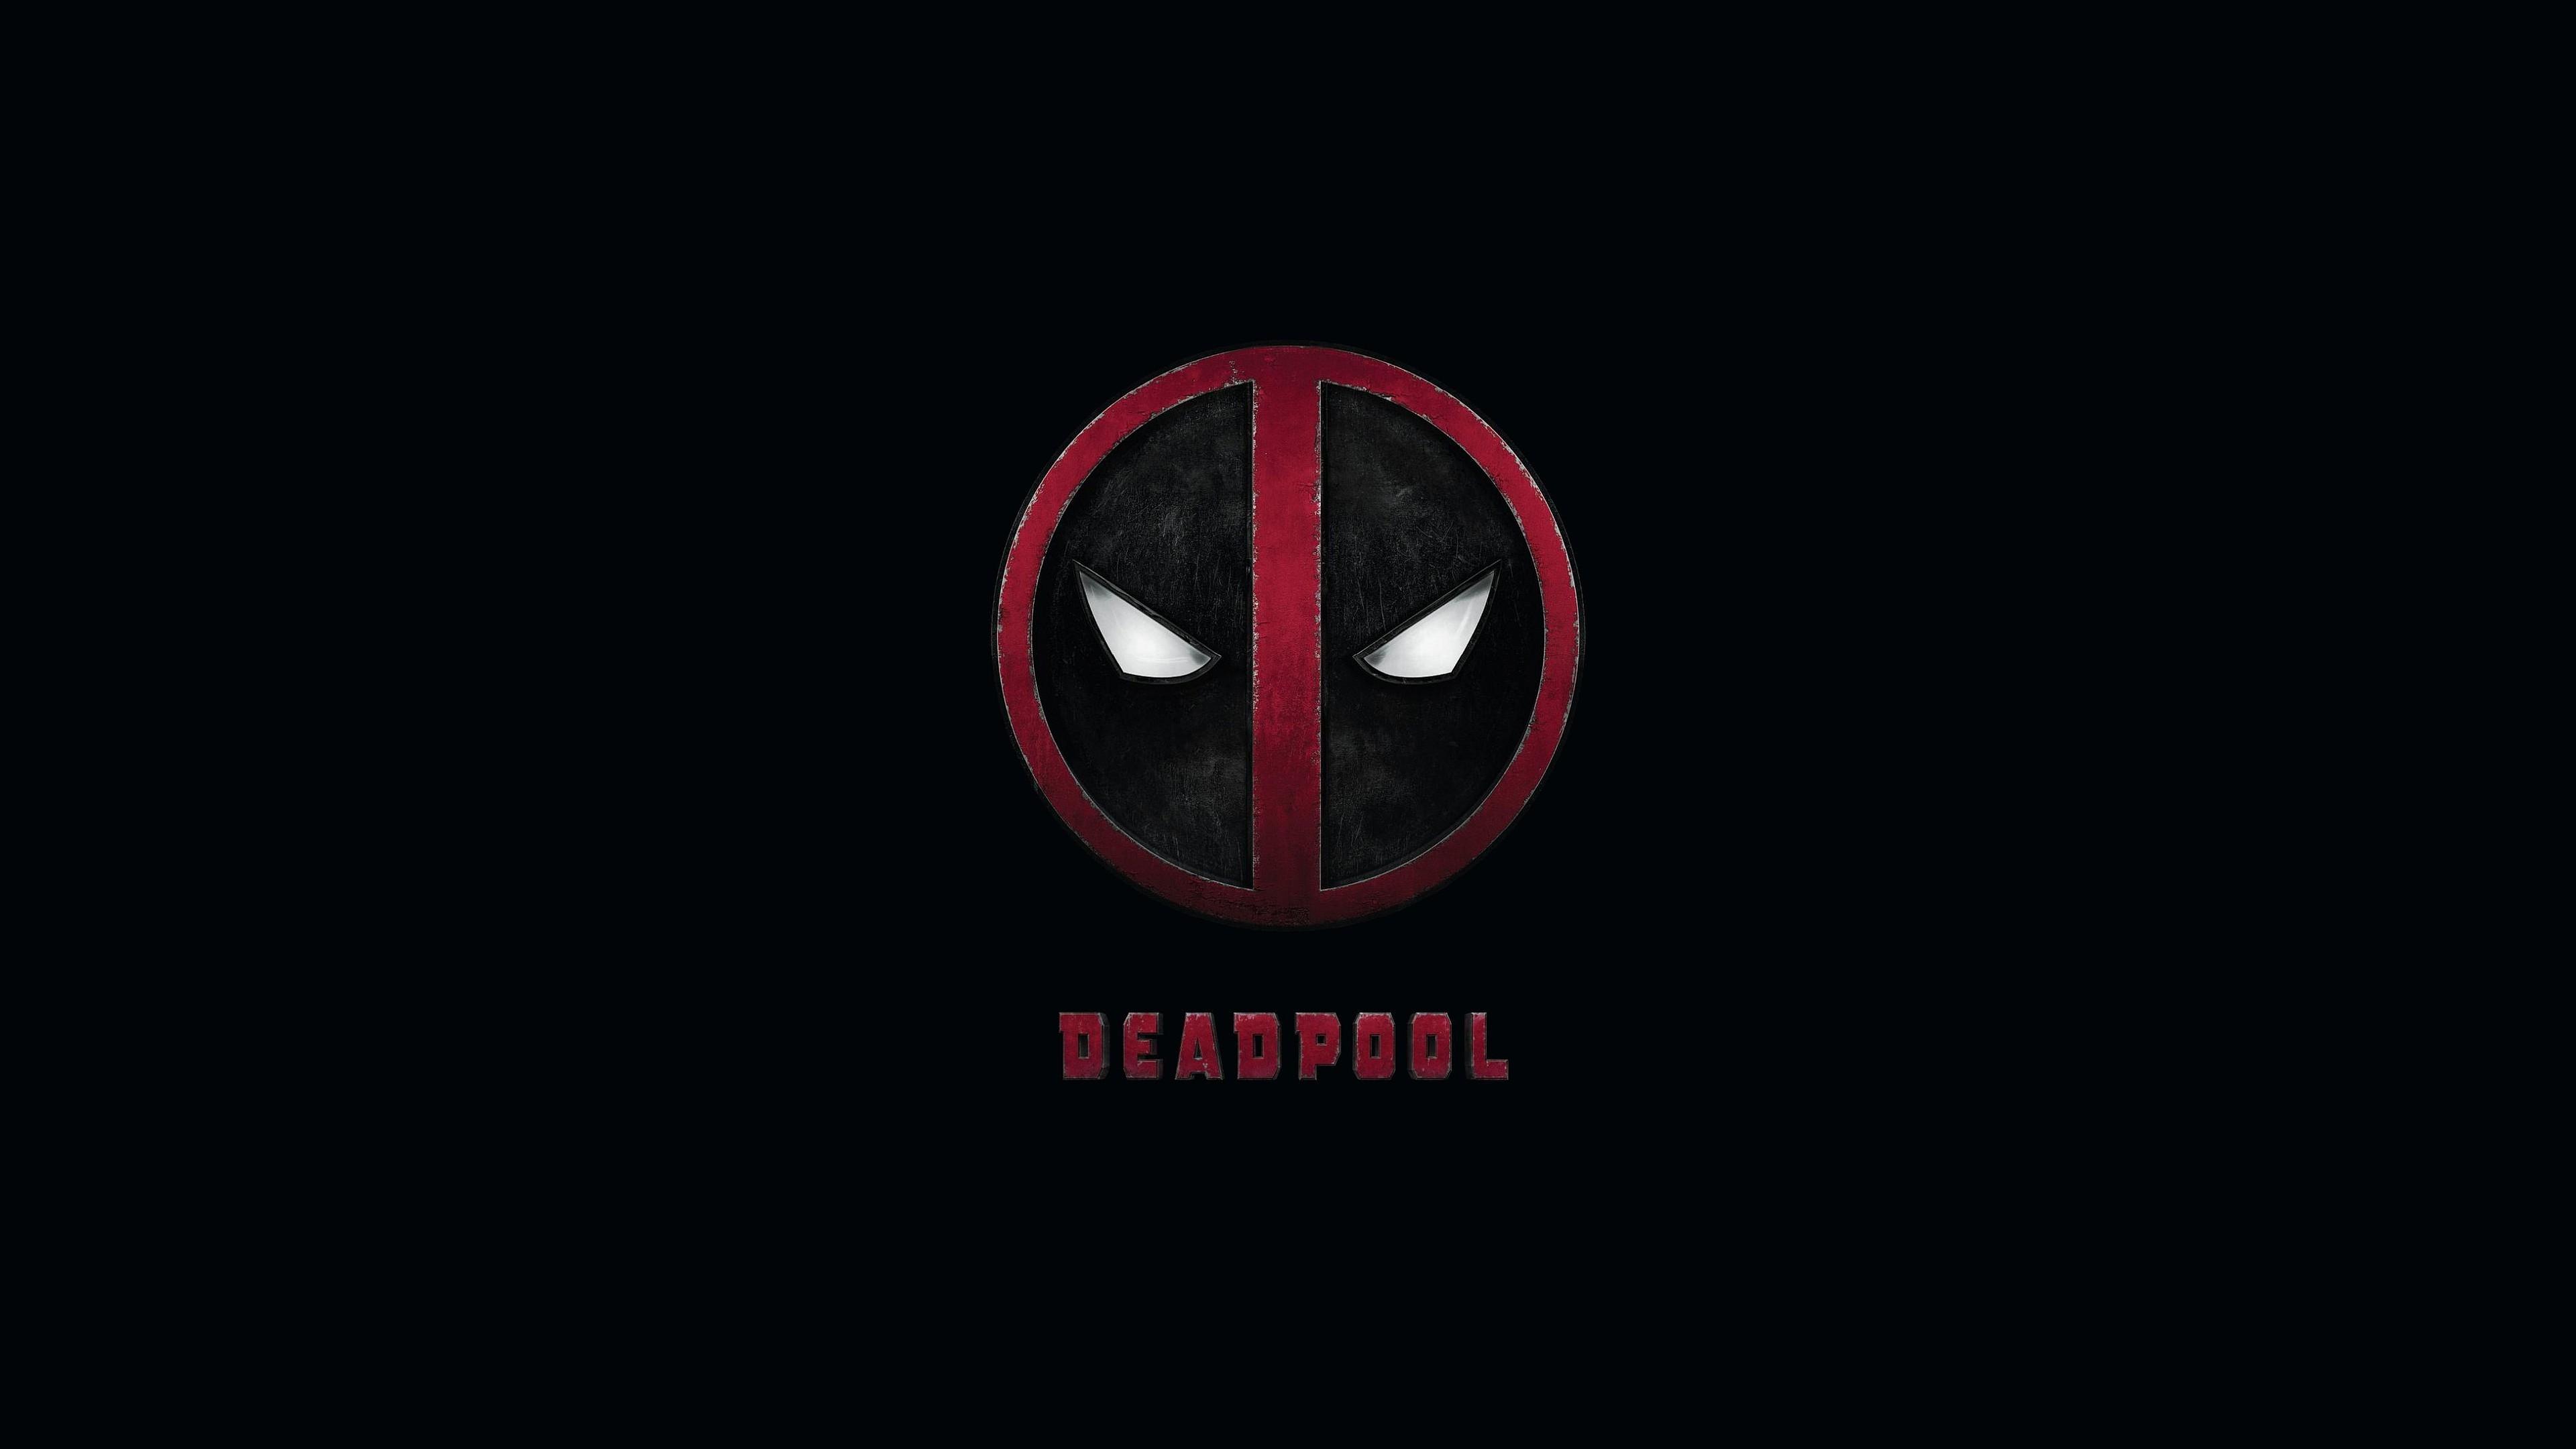 deadpool logo - photo #37